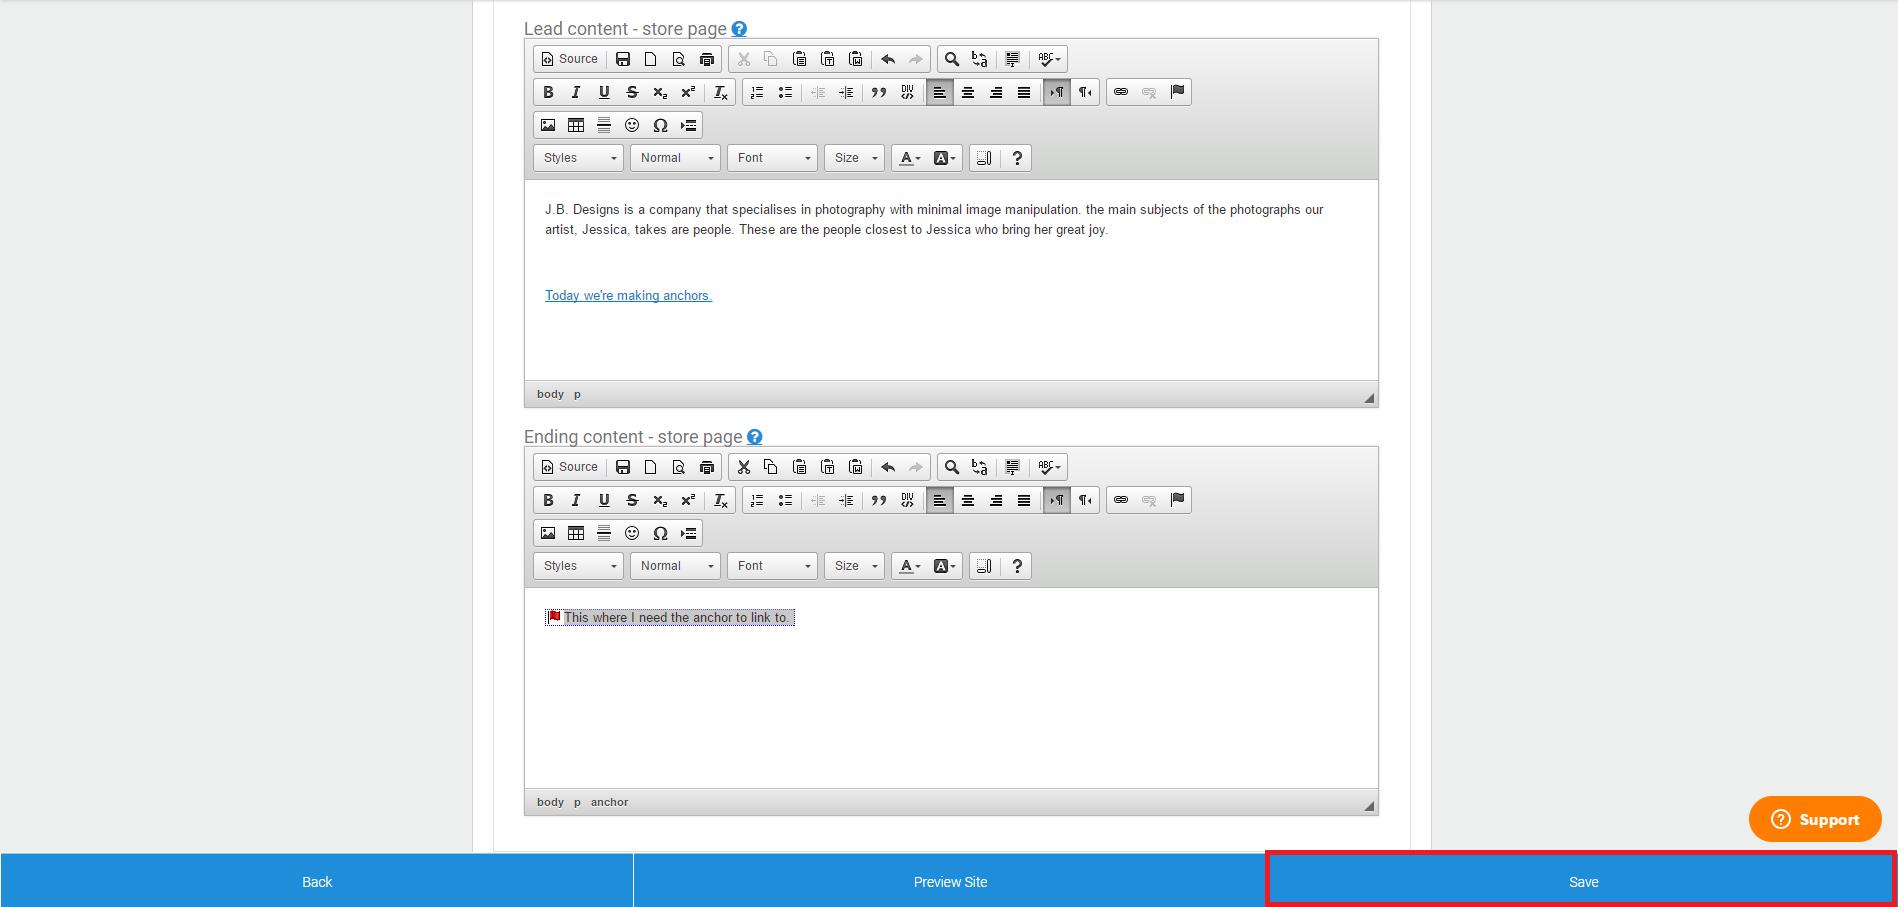 How To: Create an Anchor Using Text Via the WYSIWYG Editor